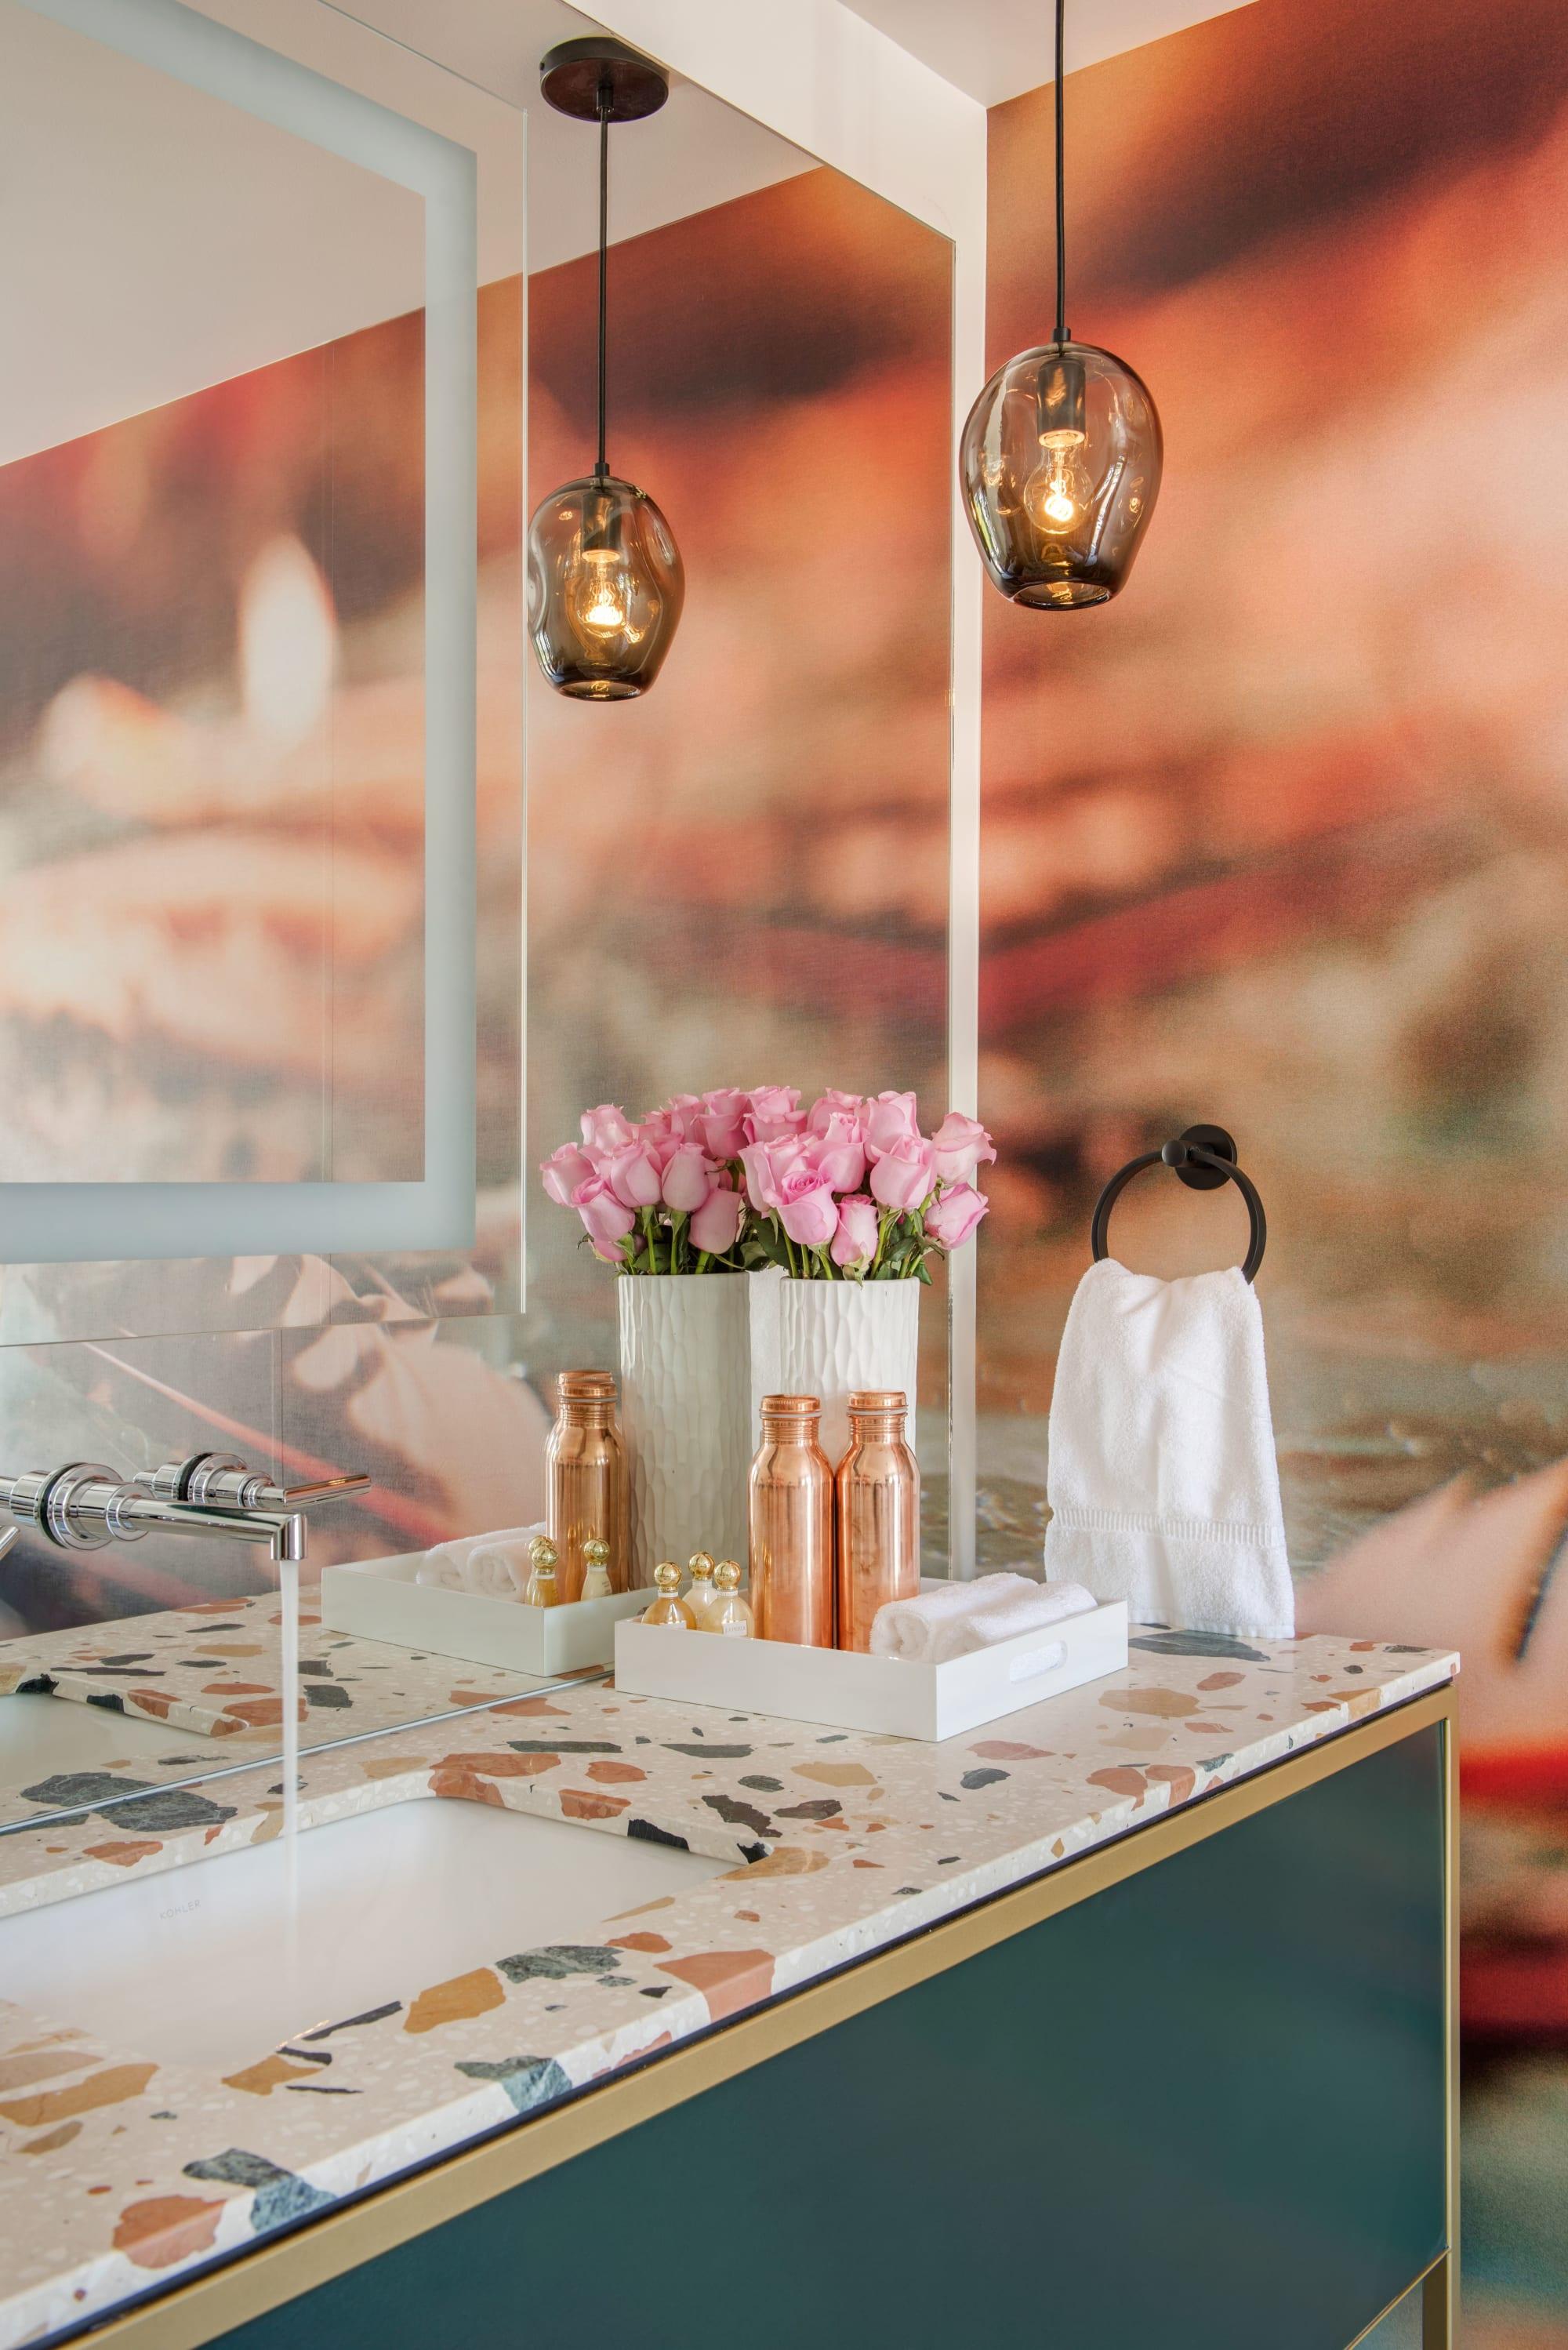 Interior Design by Abby Hetherington Interiors seen at ...